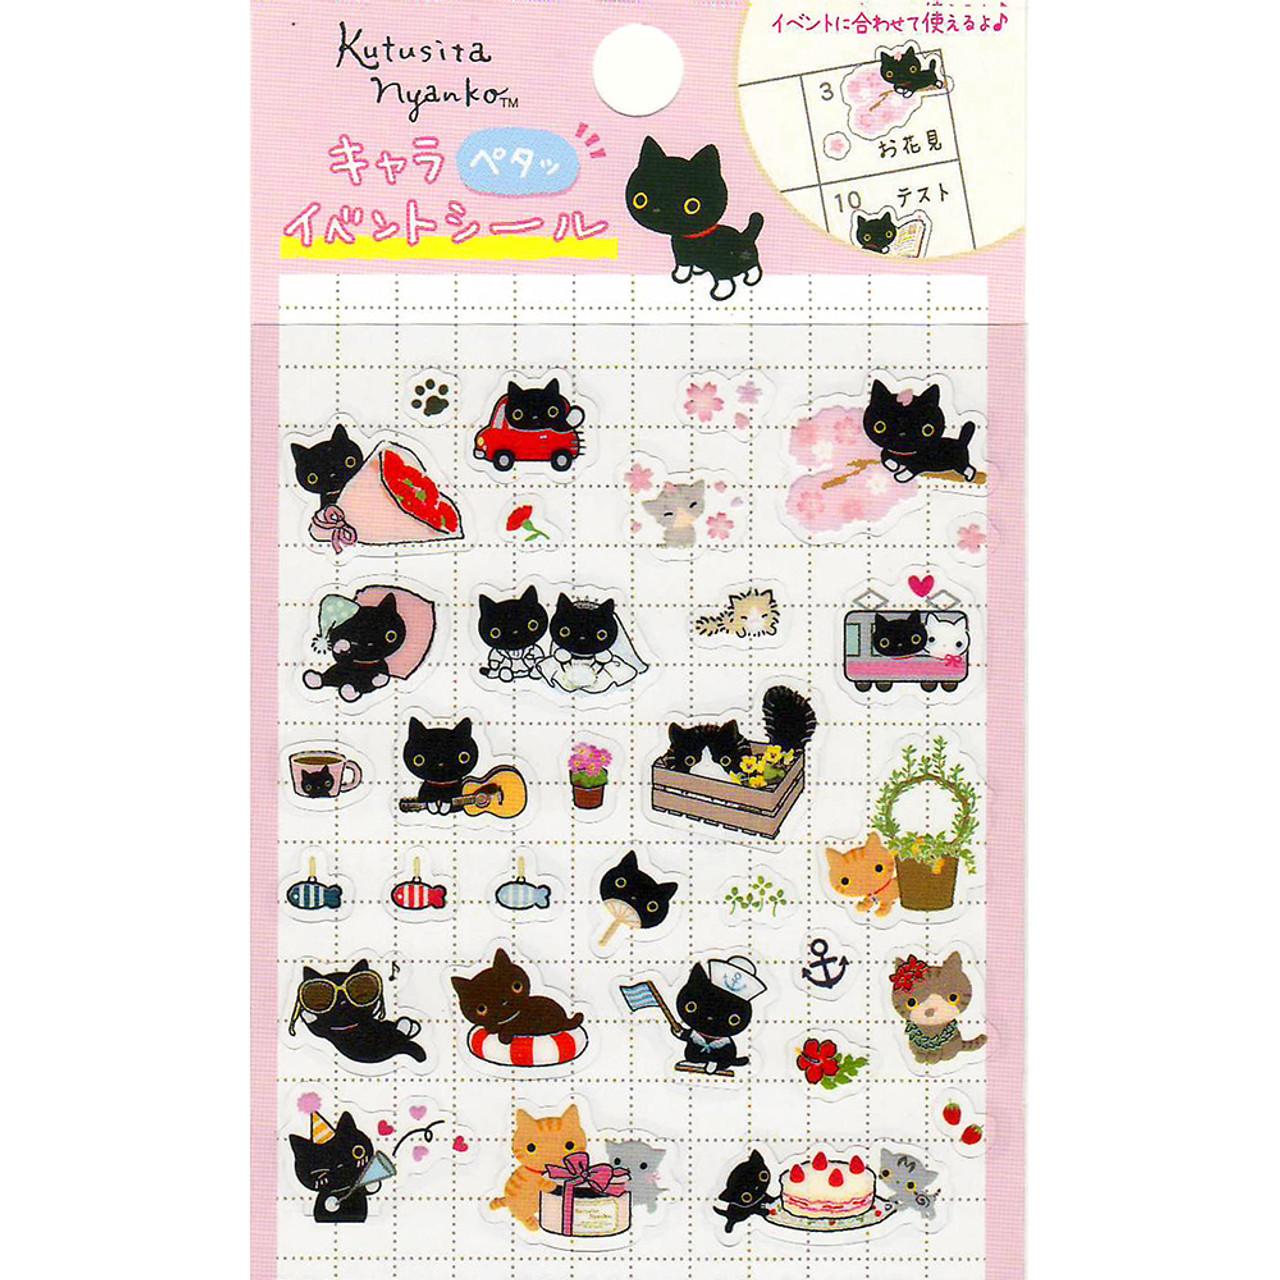 San-X Kutusita Nyanko Socks Black Cat Events Schedule Sticker SE30606 ( Close up Top )